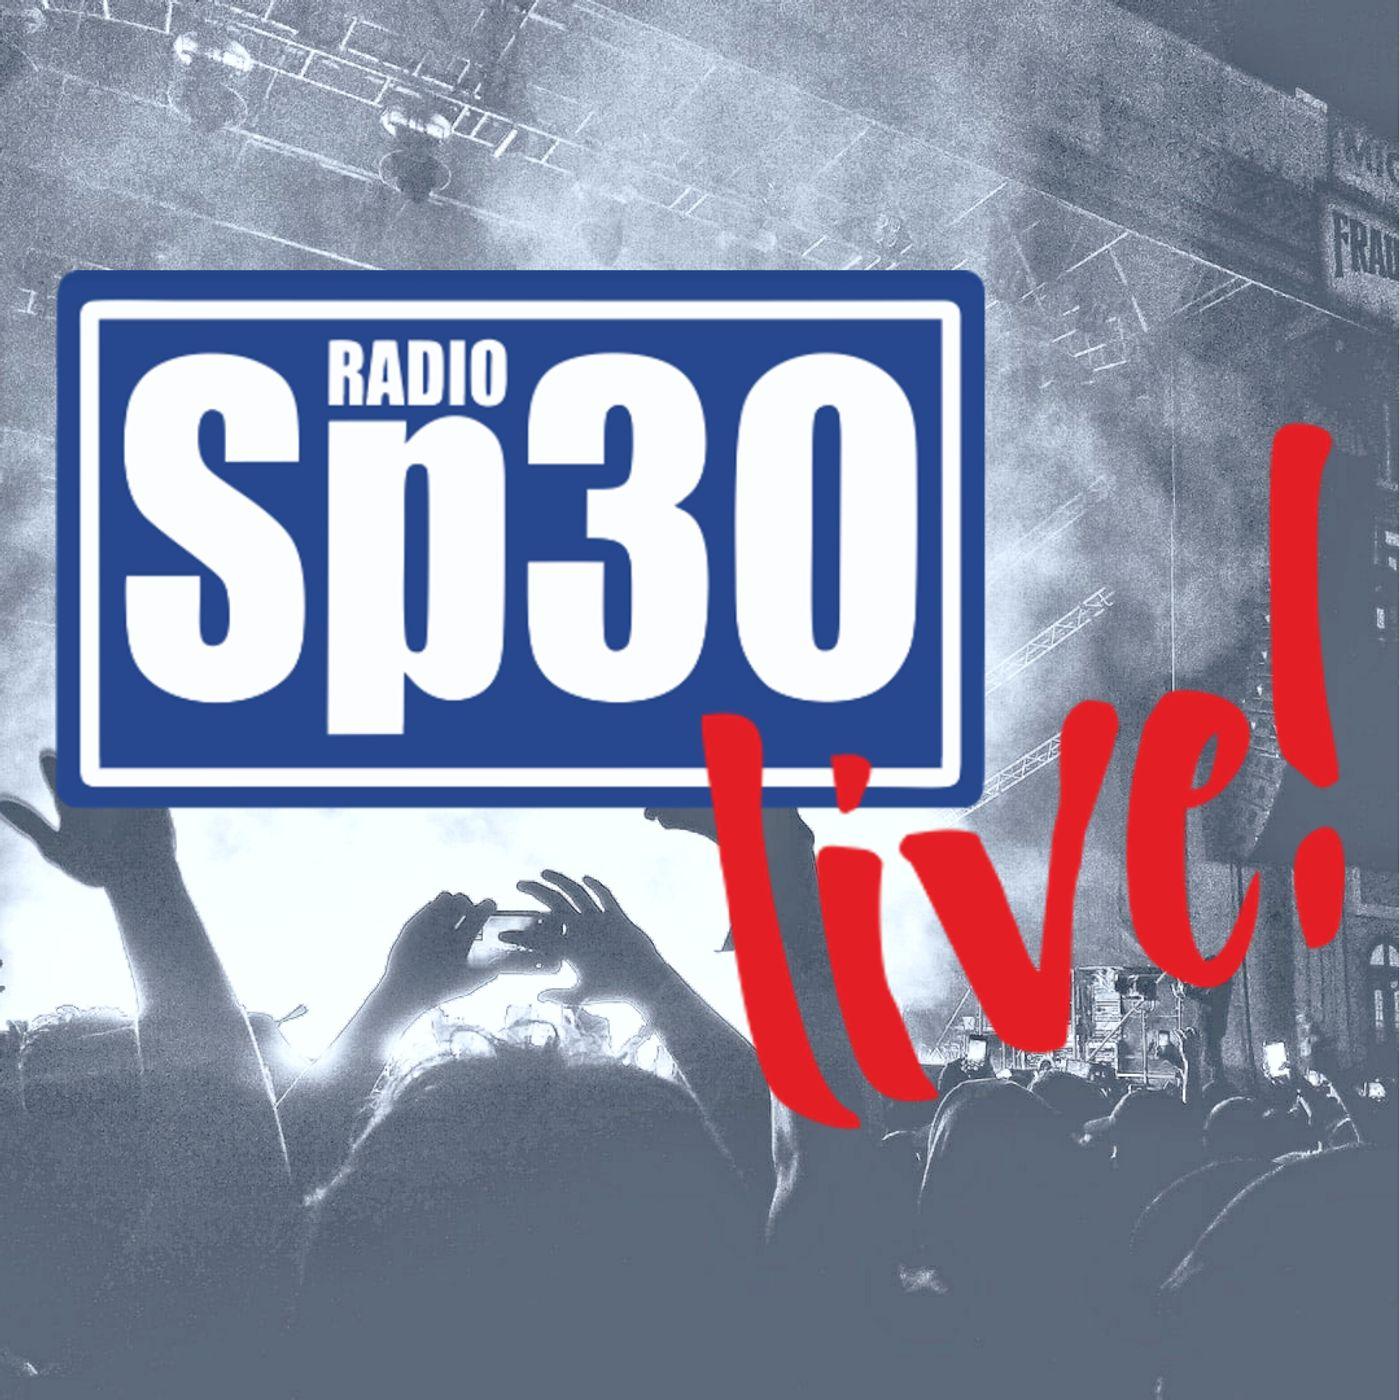 RadioSP30 Live! - #RadioSP30